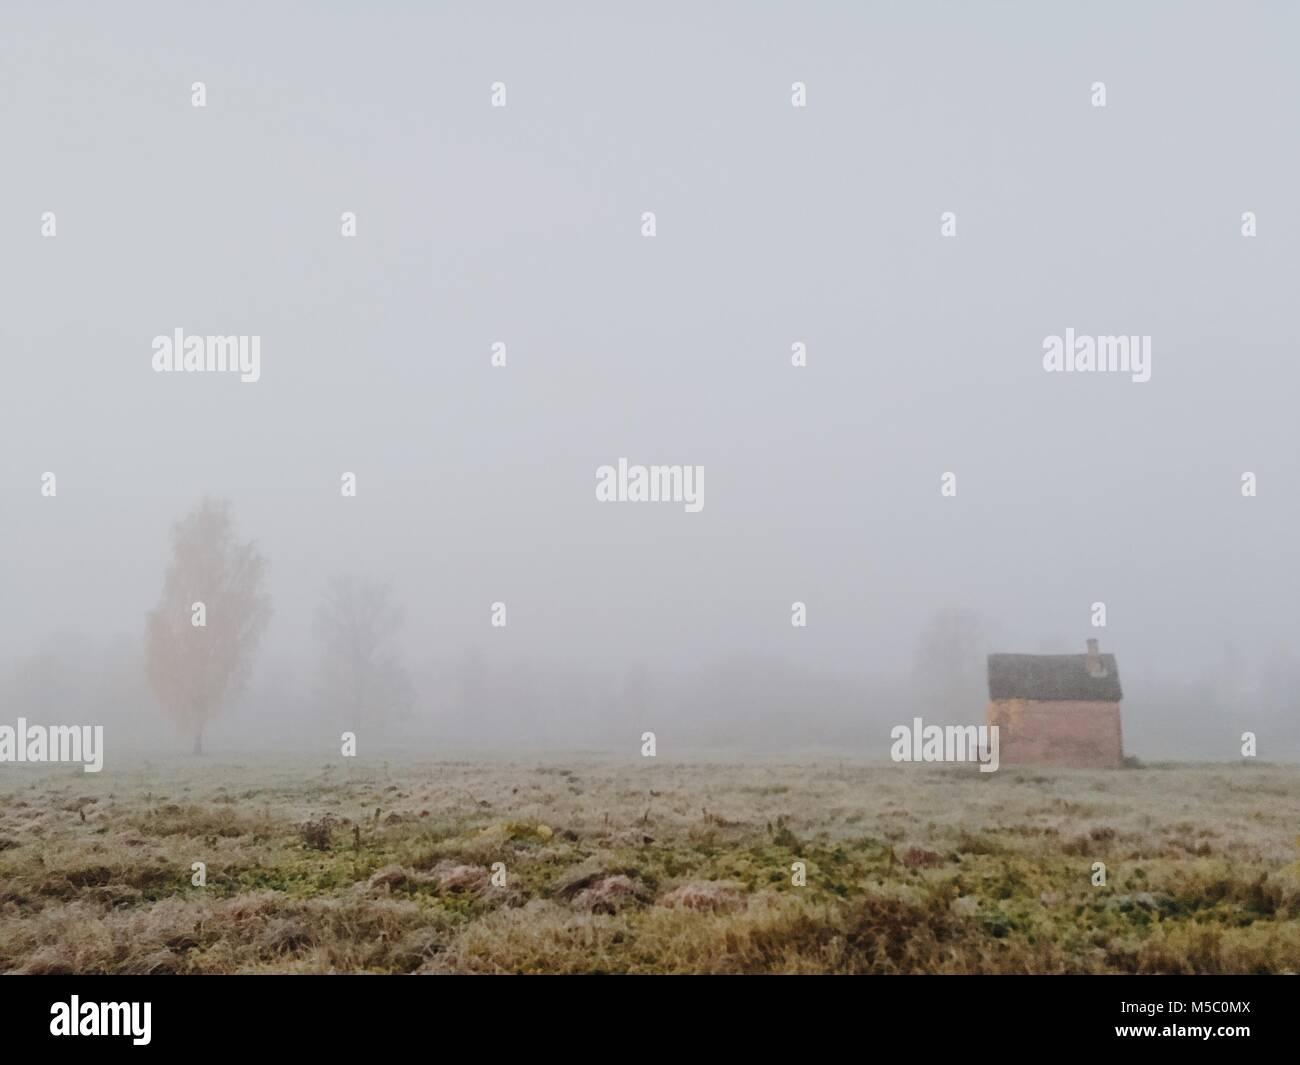 Champ d'herbe. Matin brumeux magnifique scène avec un peu d'abri. Banque D'Images